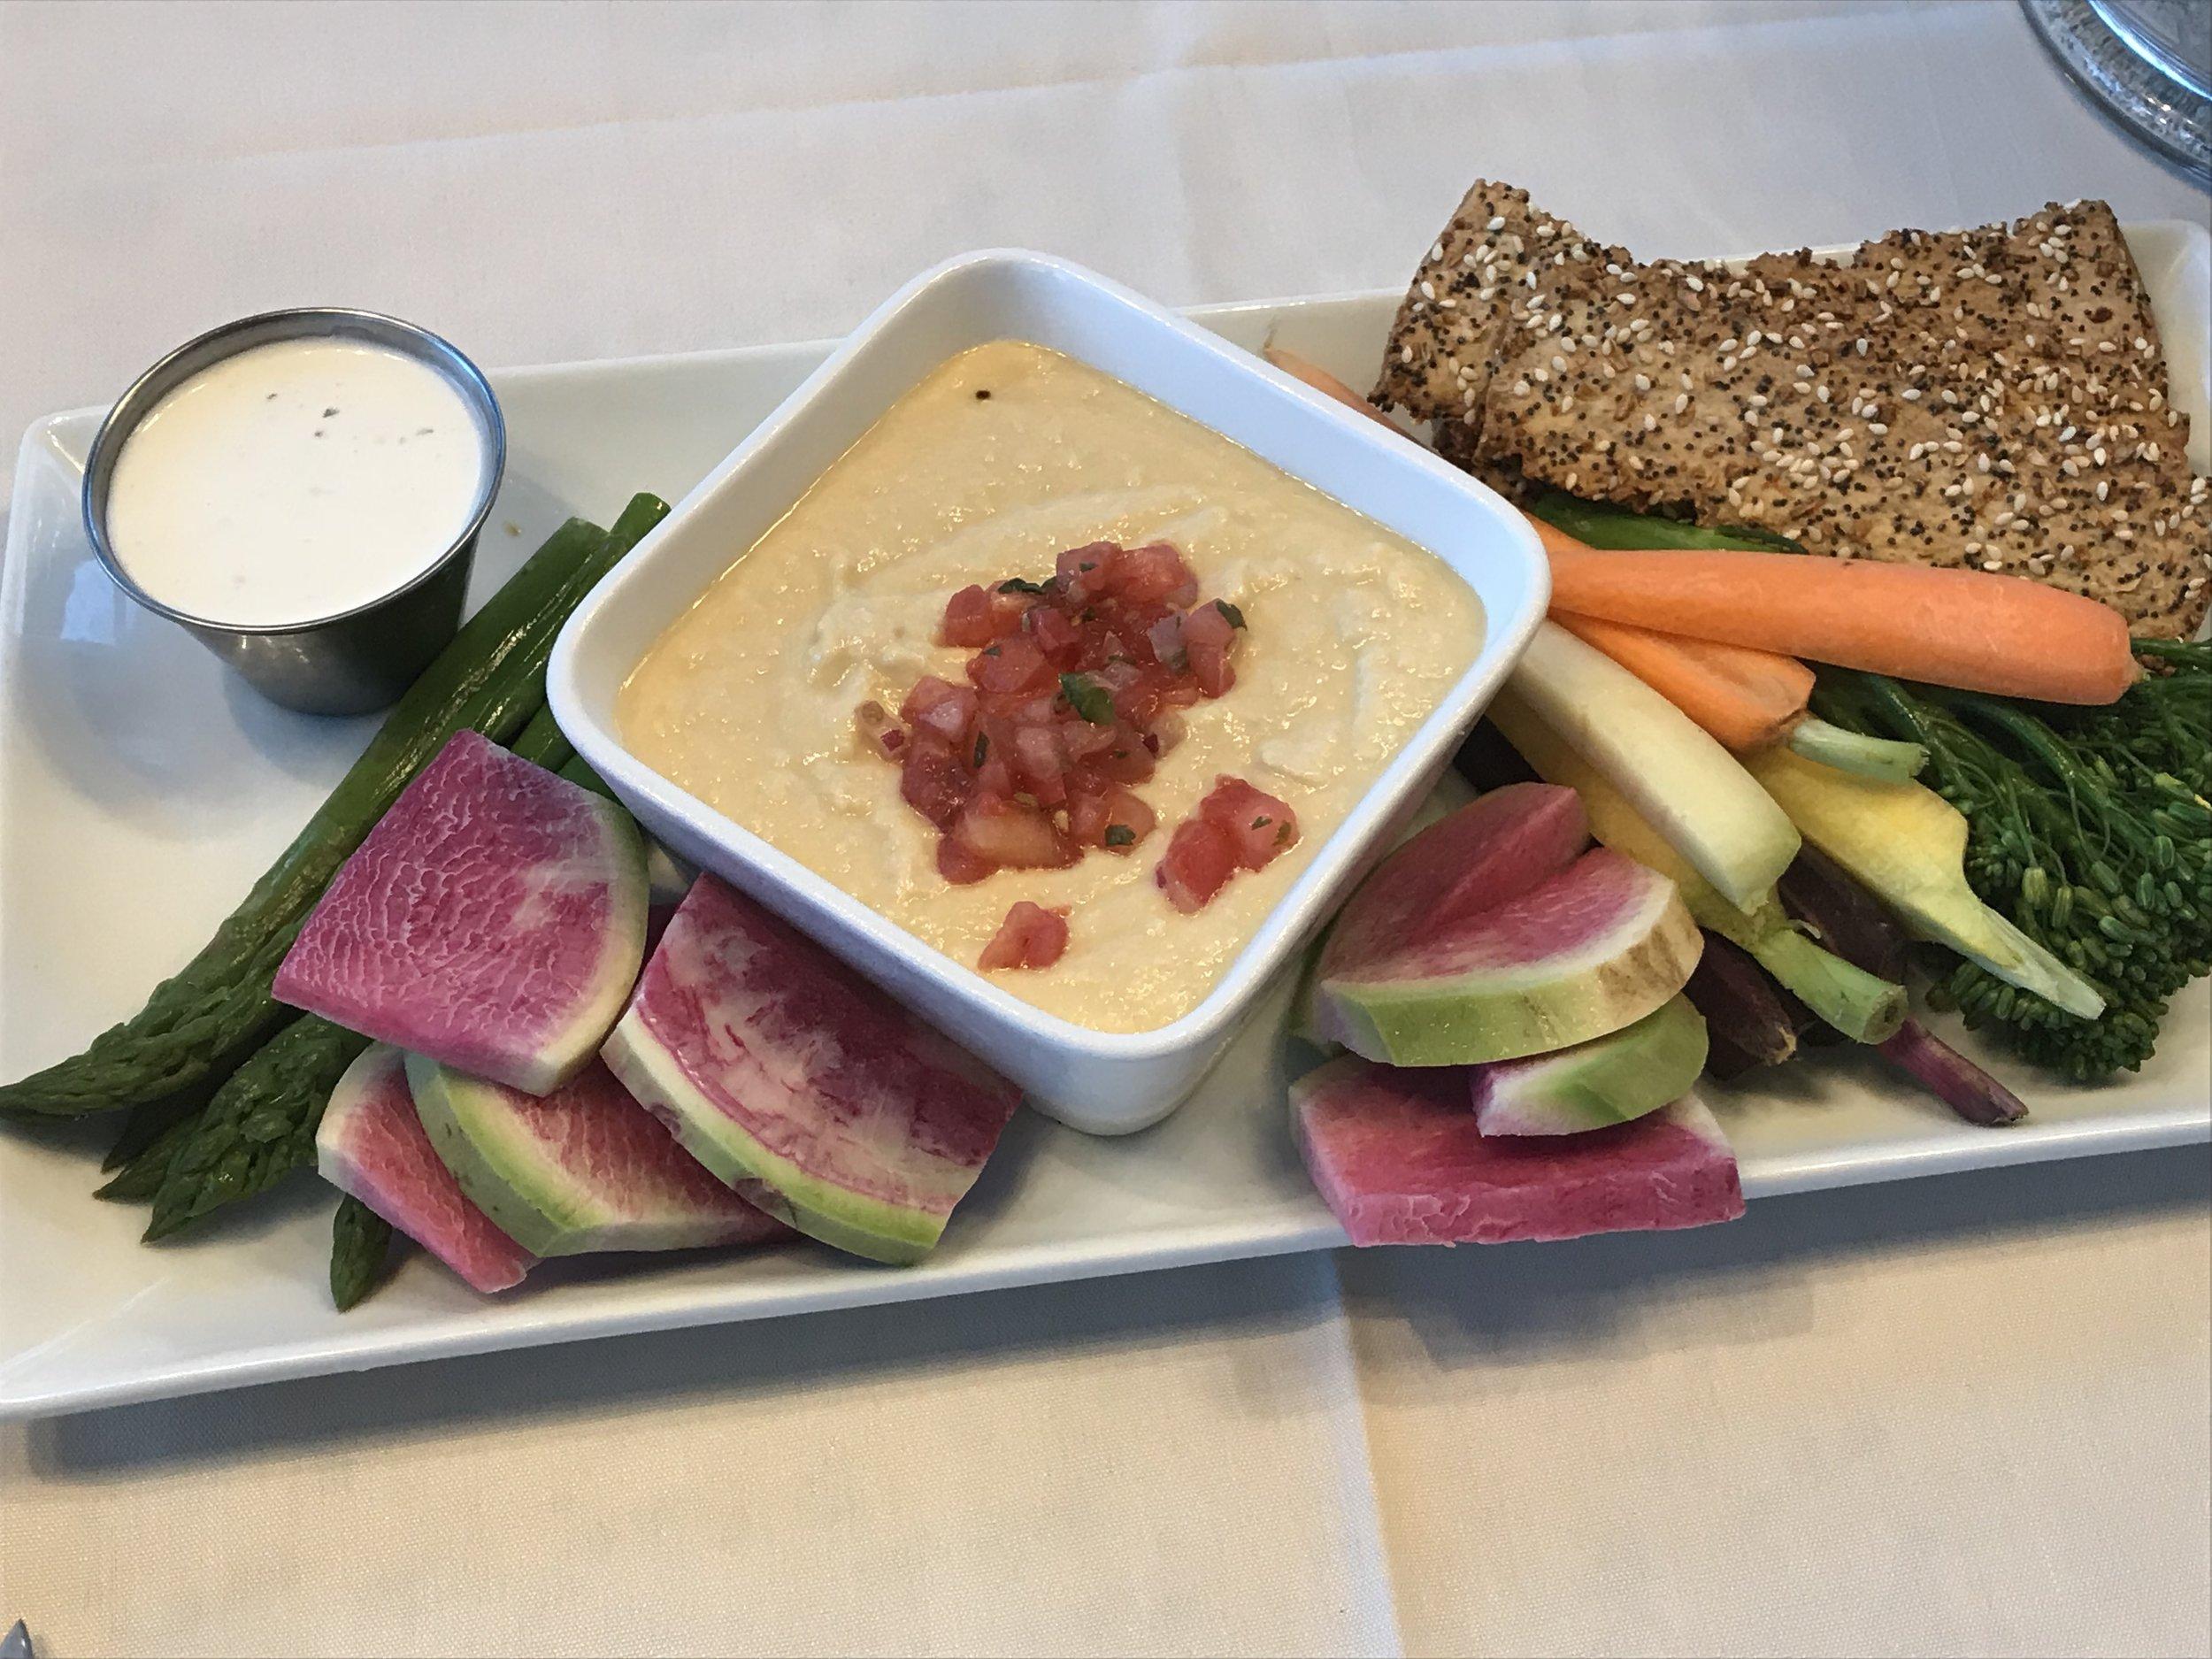 Sea Level Veggies and Hummus